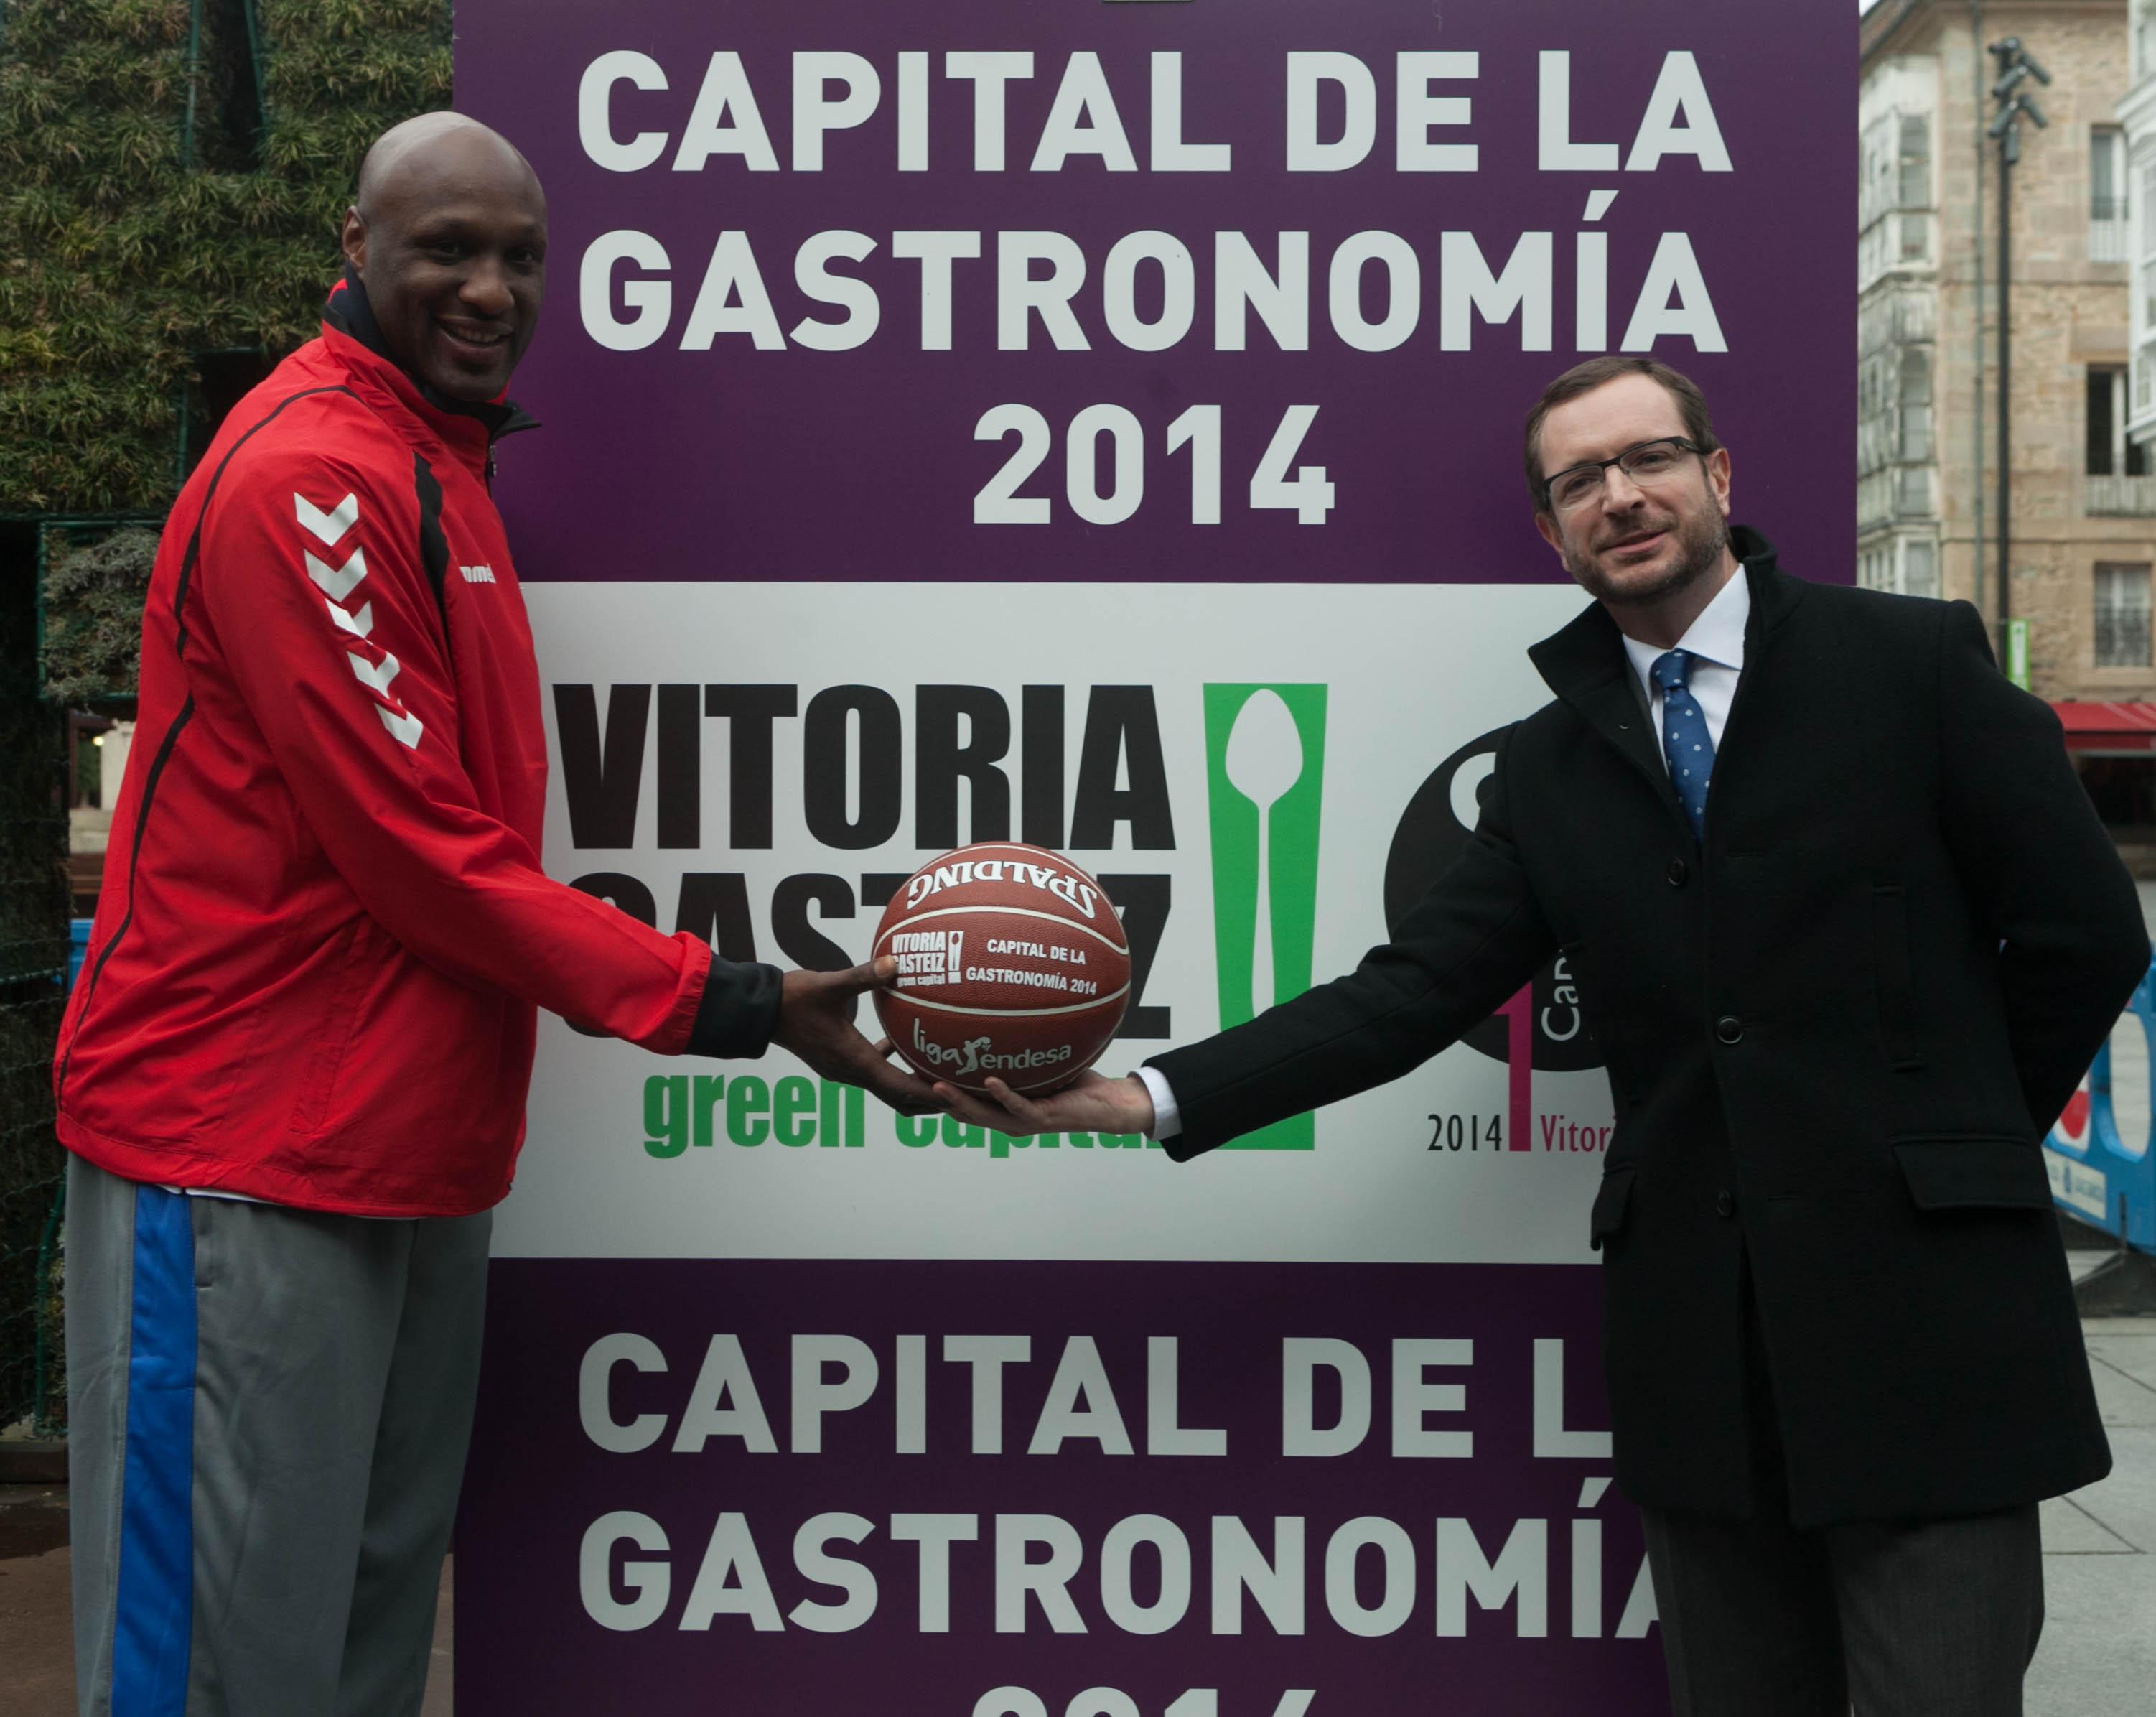 http://blogs.vitoria-gasteiz.org/medios/files/2014/02/lamar-maroto-2.jpg